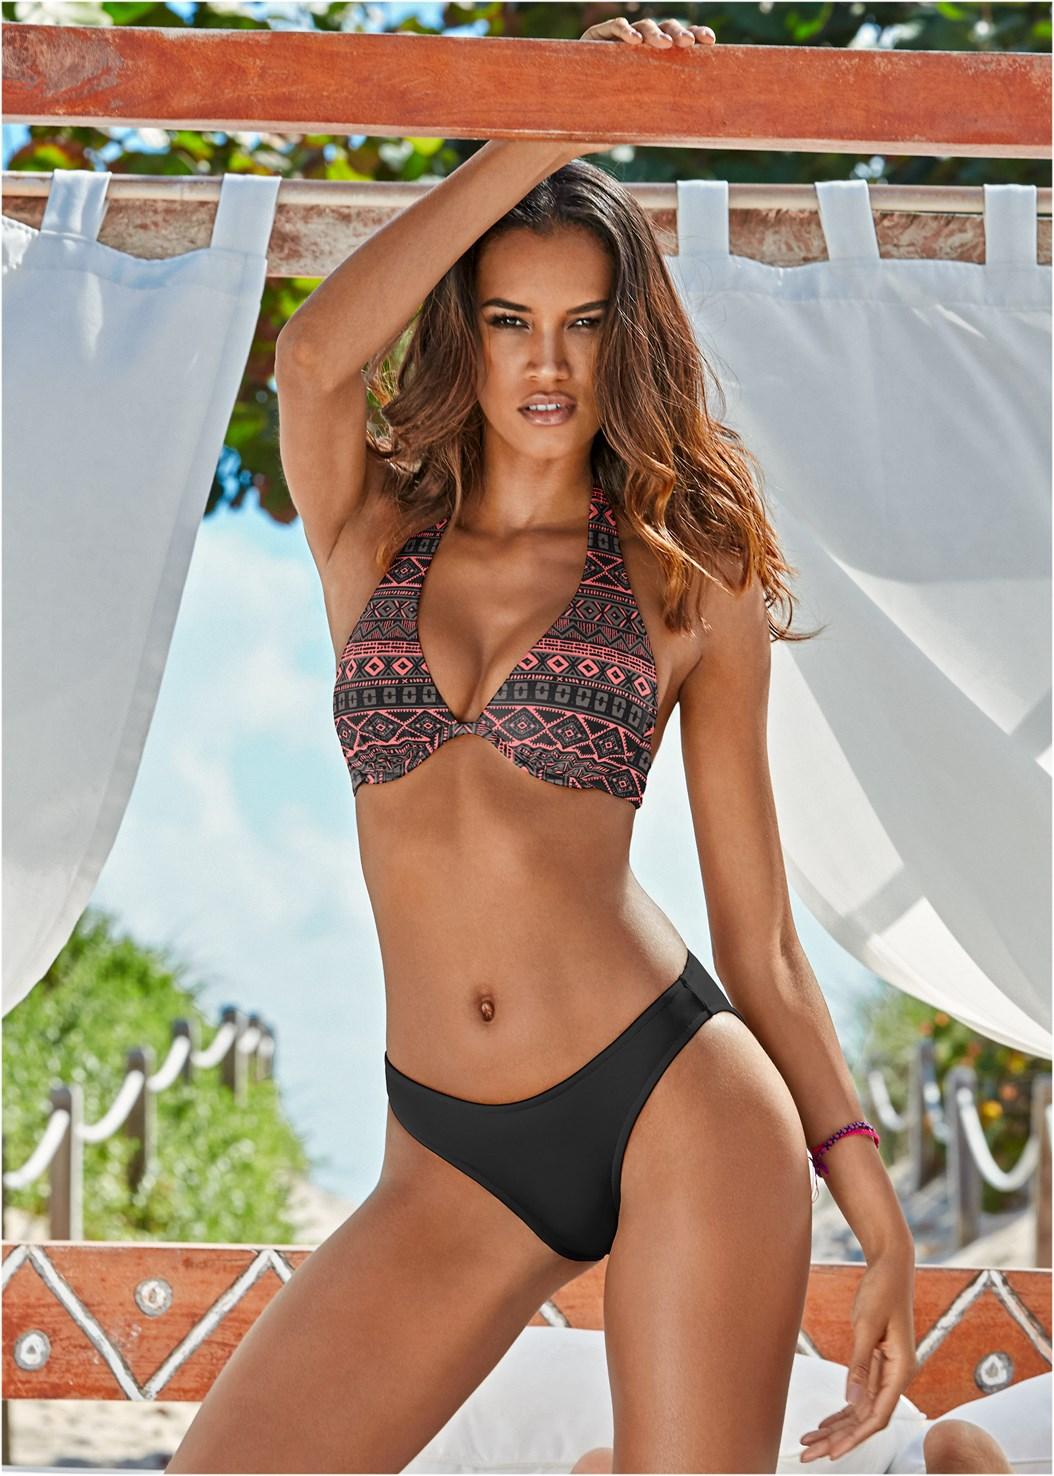 Scoop Front Classic Bikini Bottom ,Underwire Halter Bikini Top,Charming Full Bra Top,Mesh High Neck Bikini Top,Tank Blouson Tankini